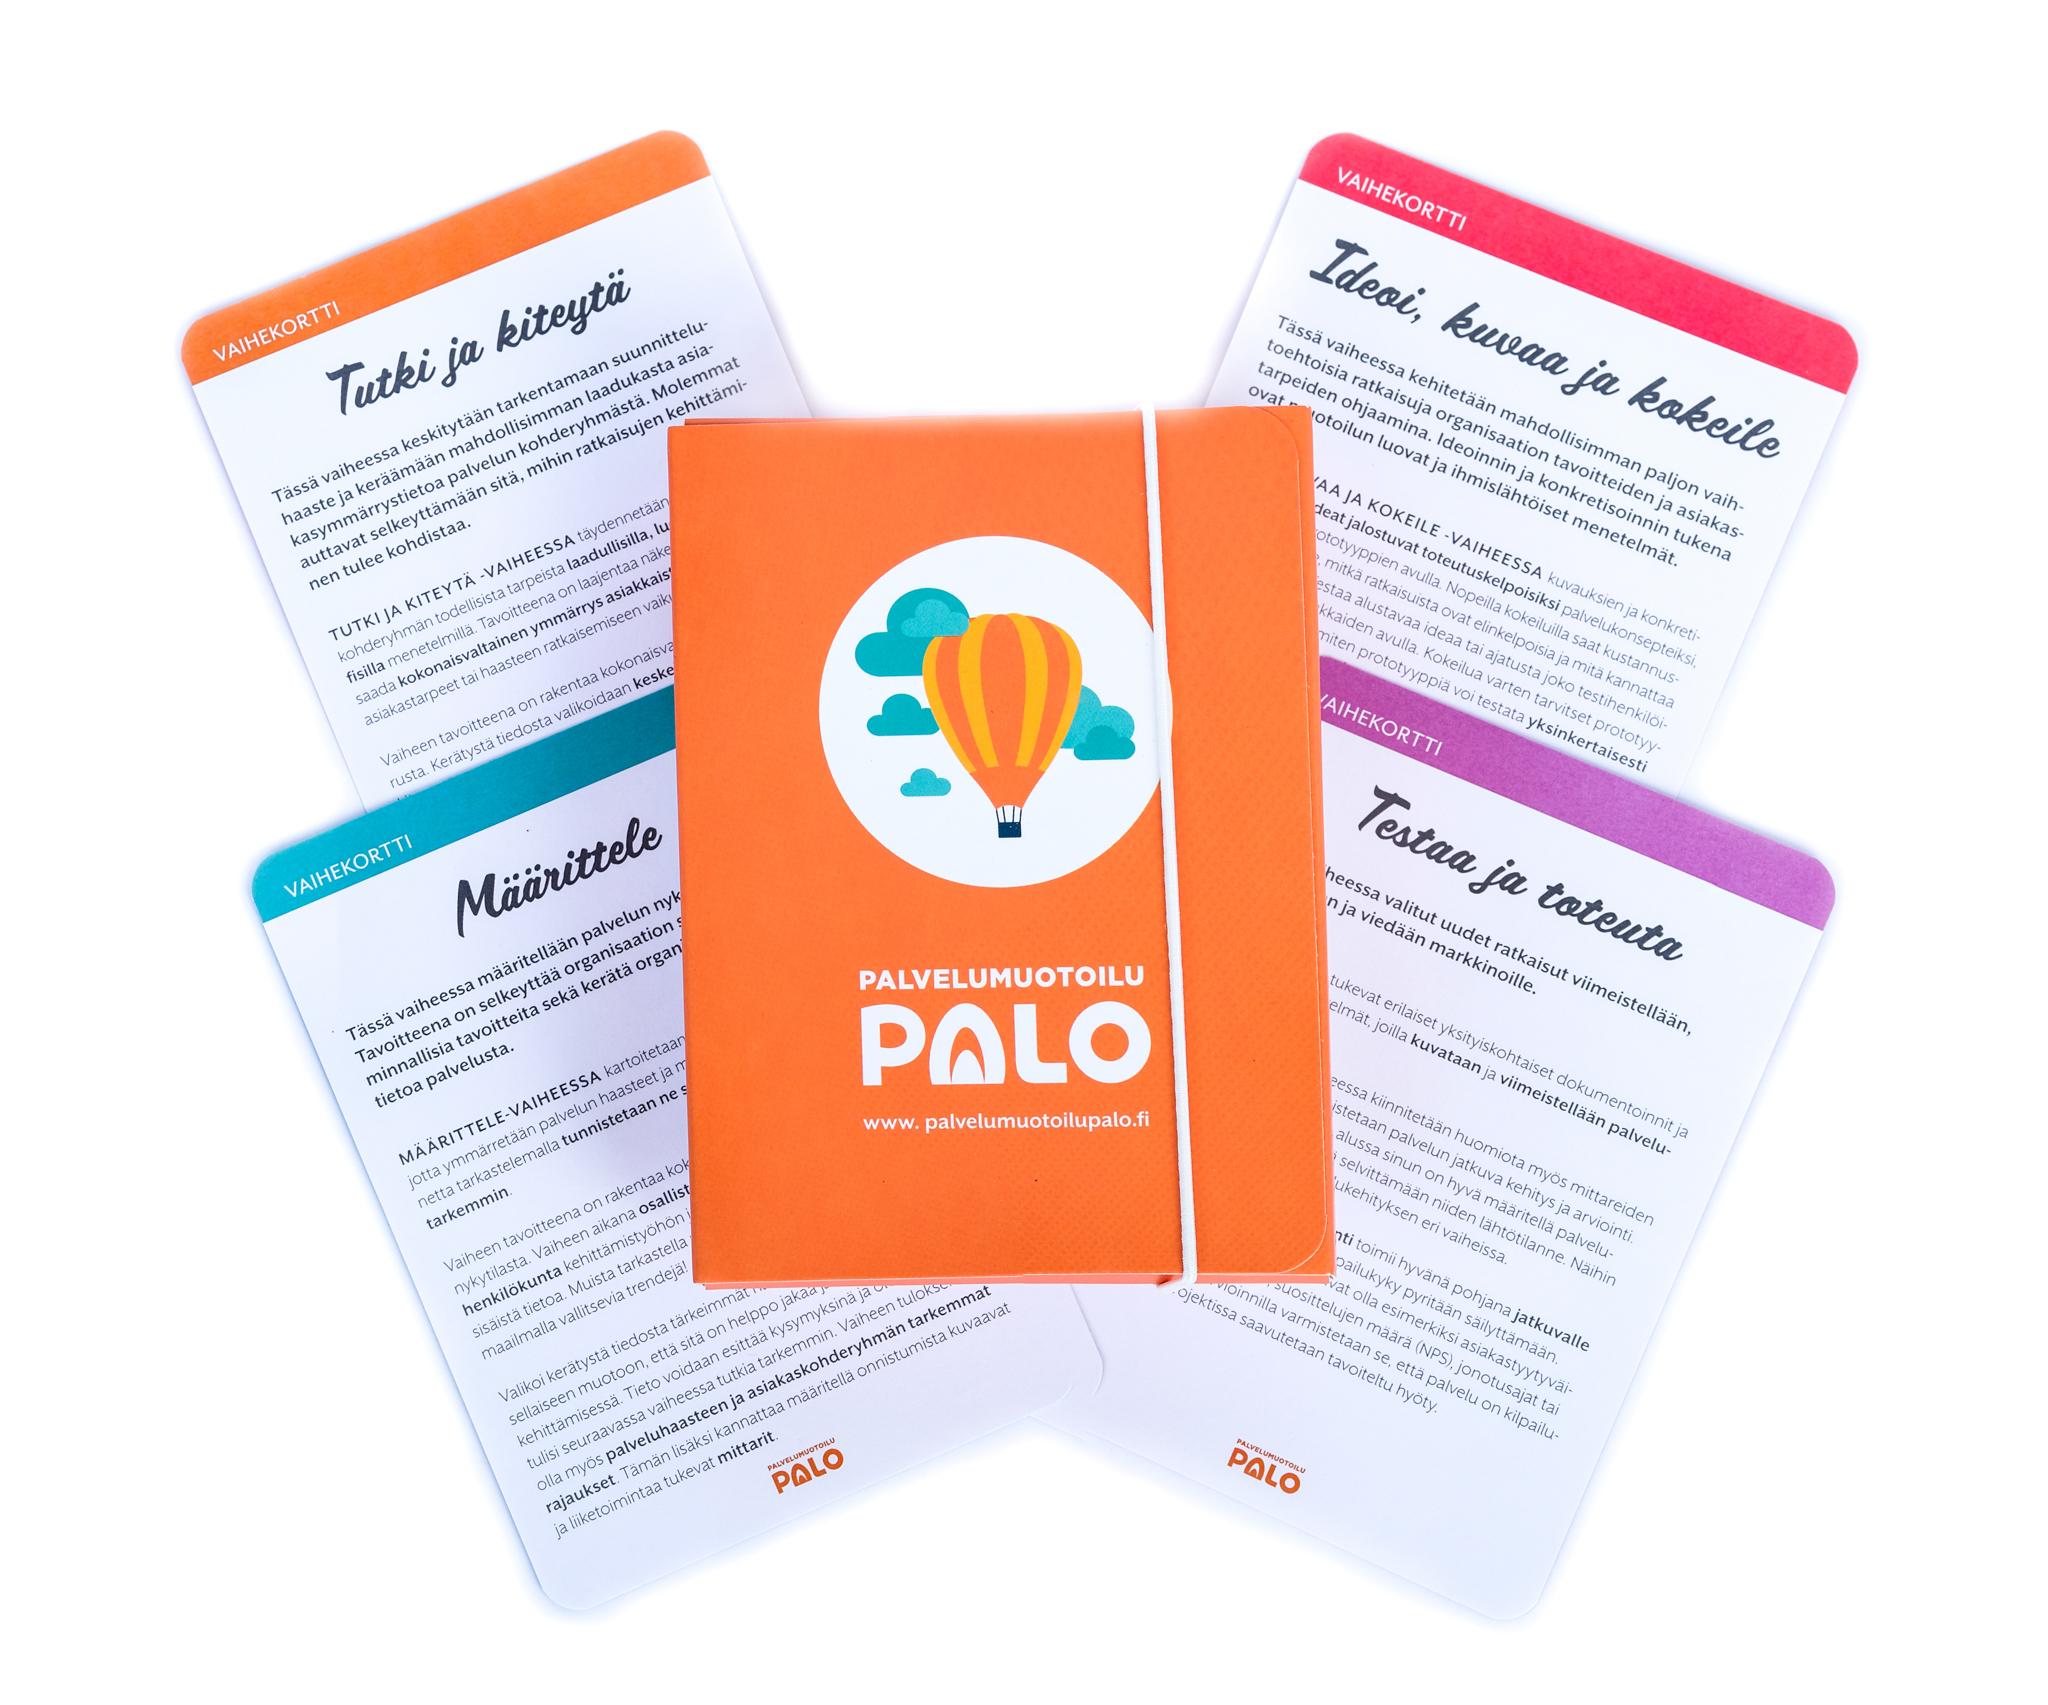 025-PaloKortit-323-MHON379520180828-Pano-20180831.jpg